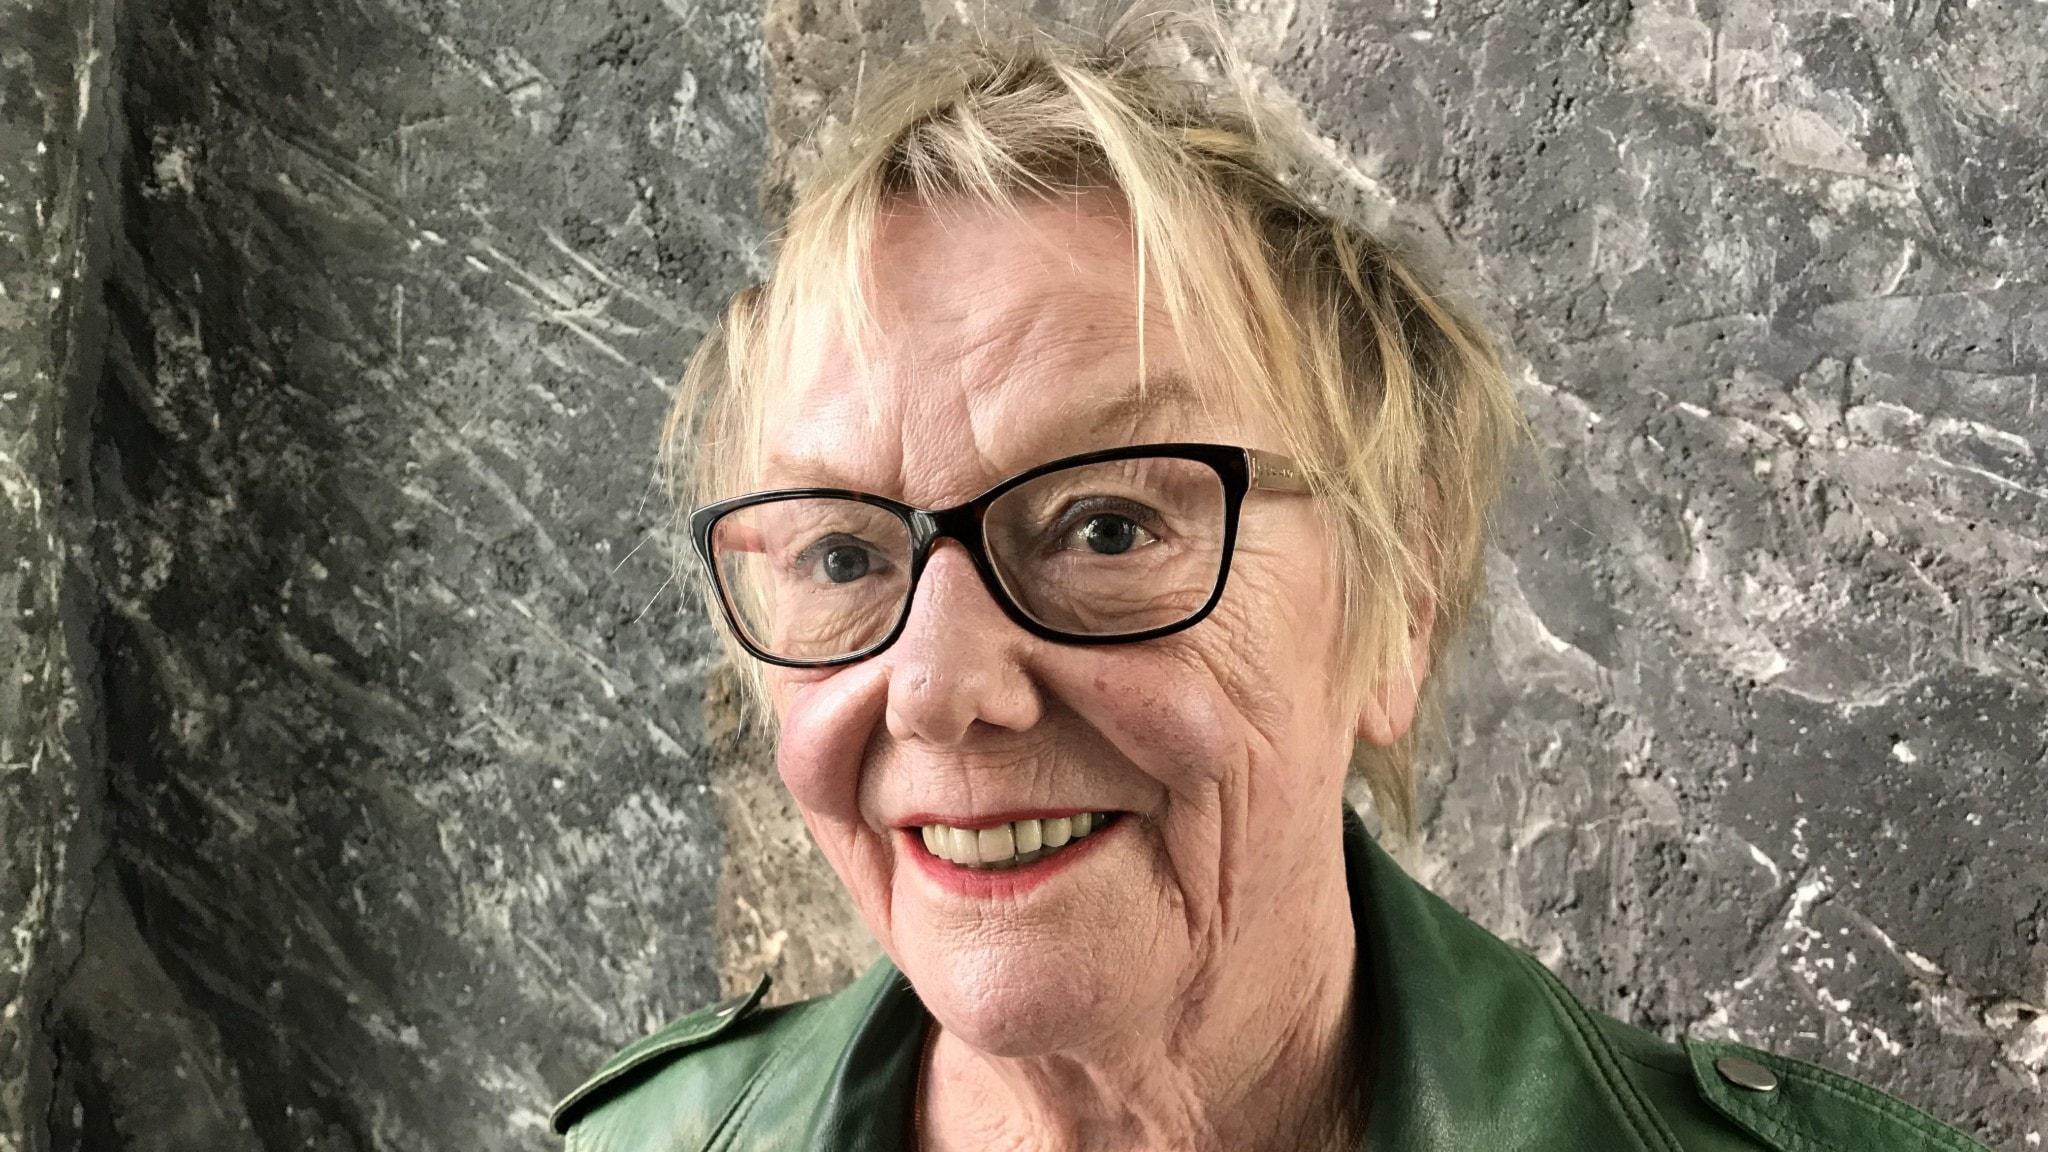 Soilin seurassa suomenkielisen radiotoiminnan pioneeri Eeva Lindh